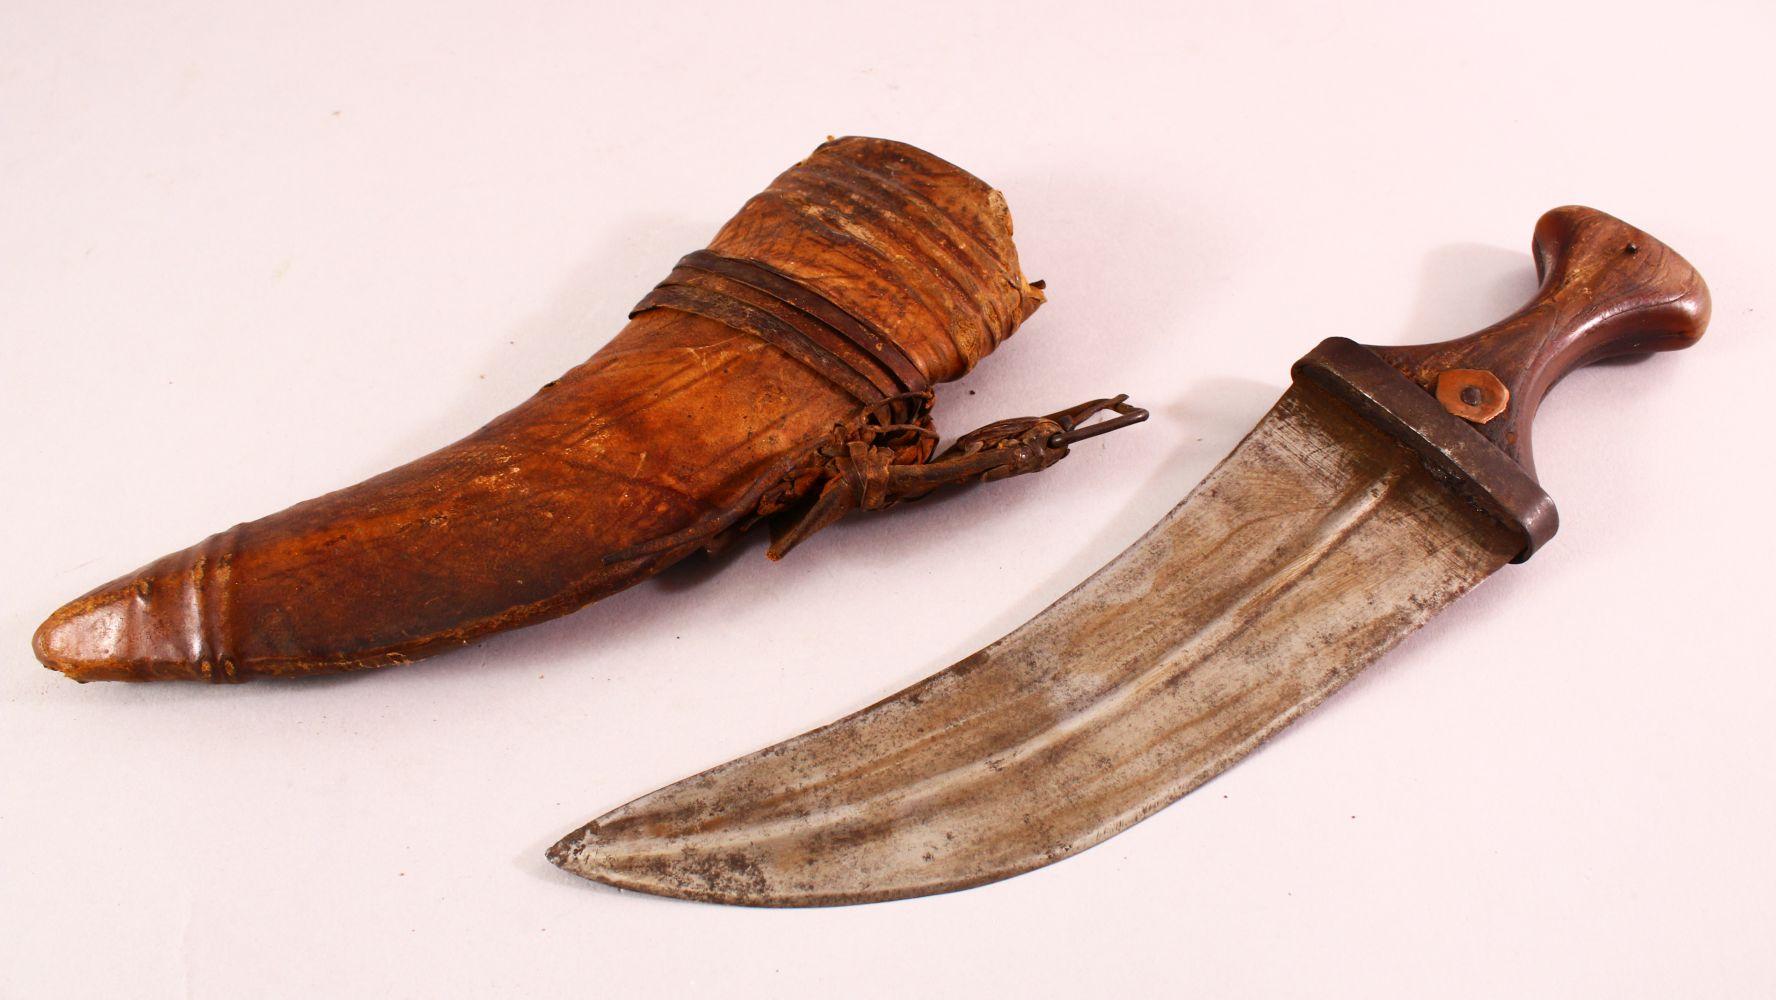 AN ARAB JAMBIYA DAGGER, with horn handle and hide scabbard, 31cm long.